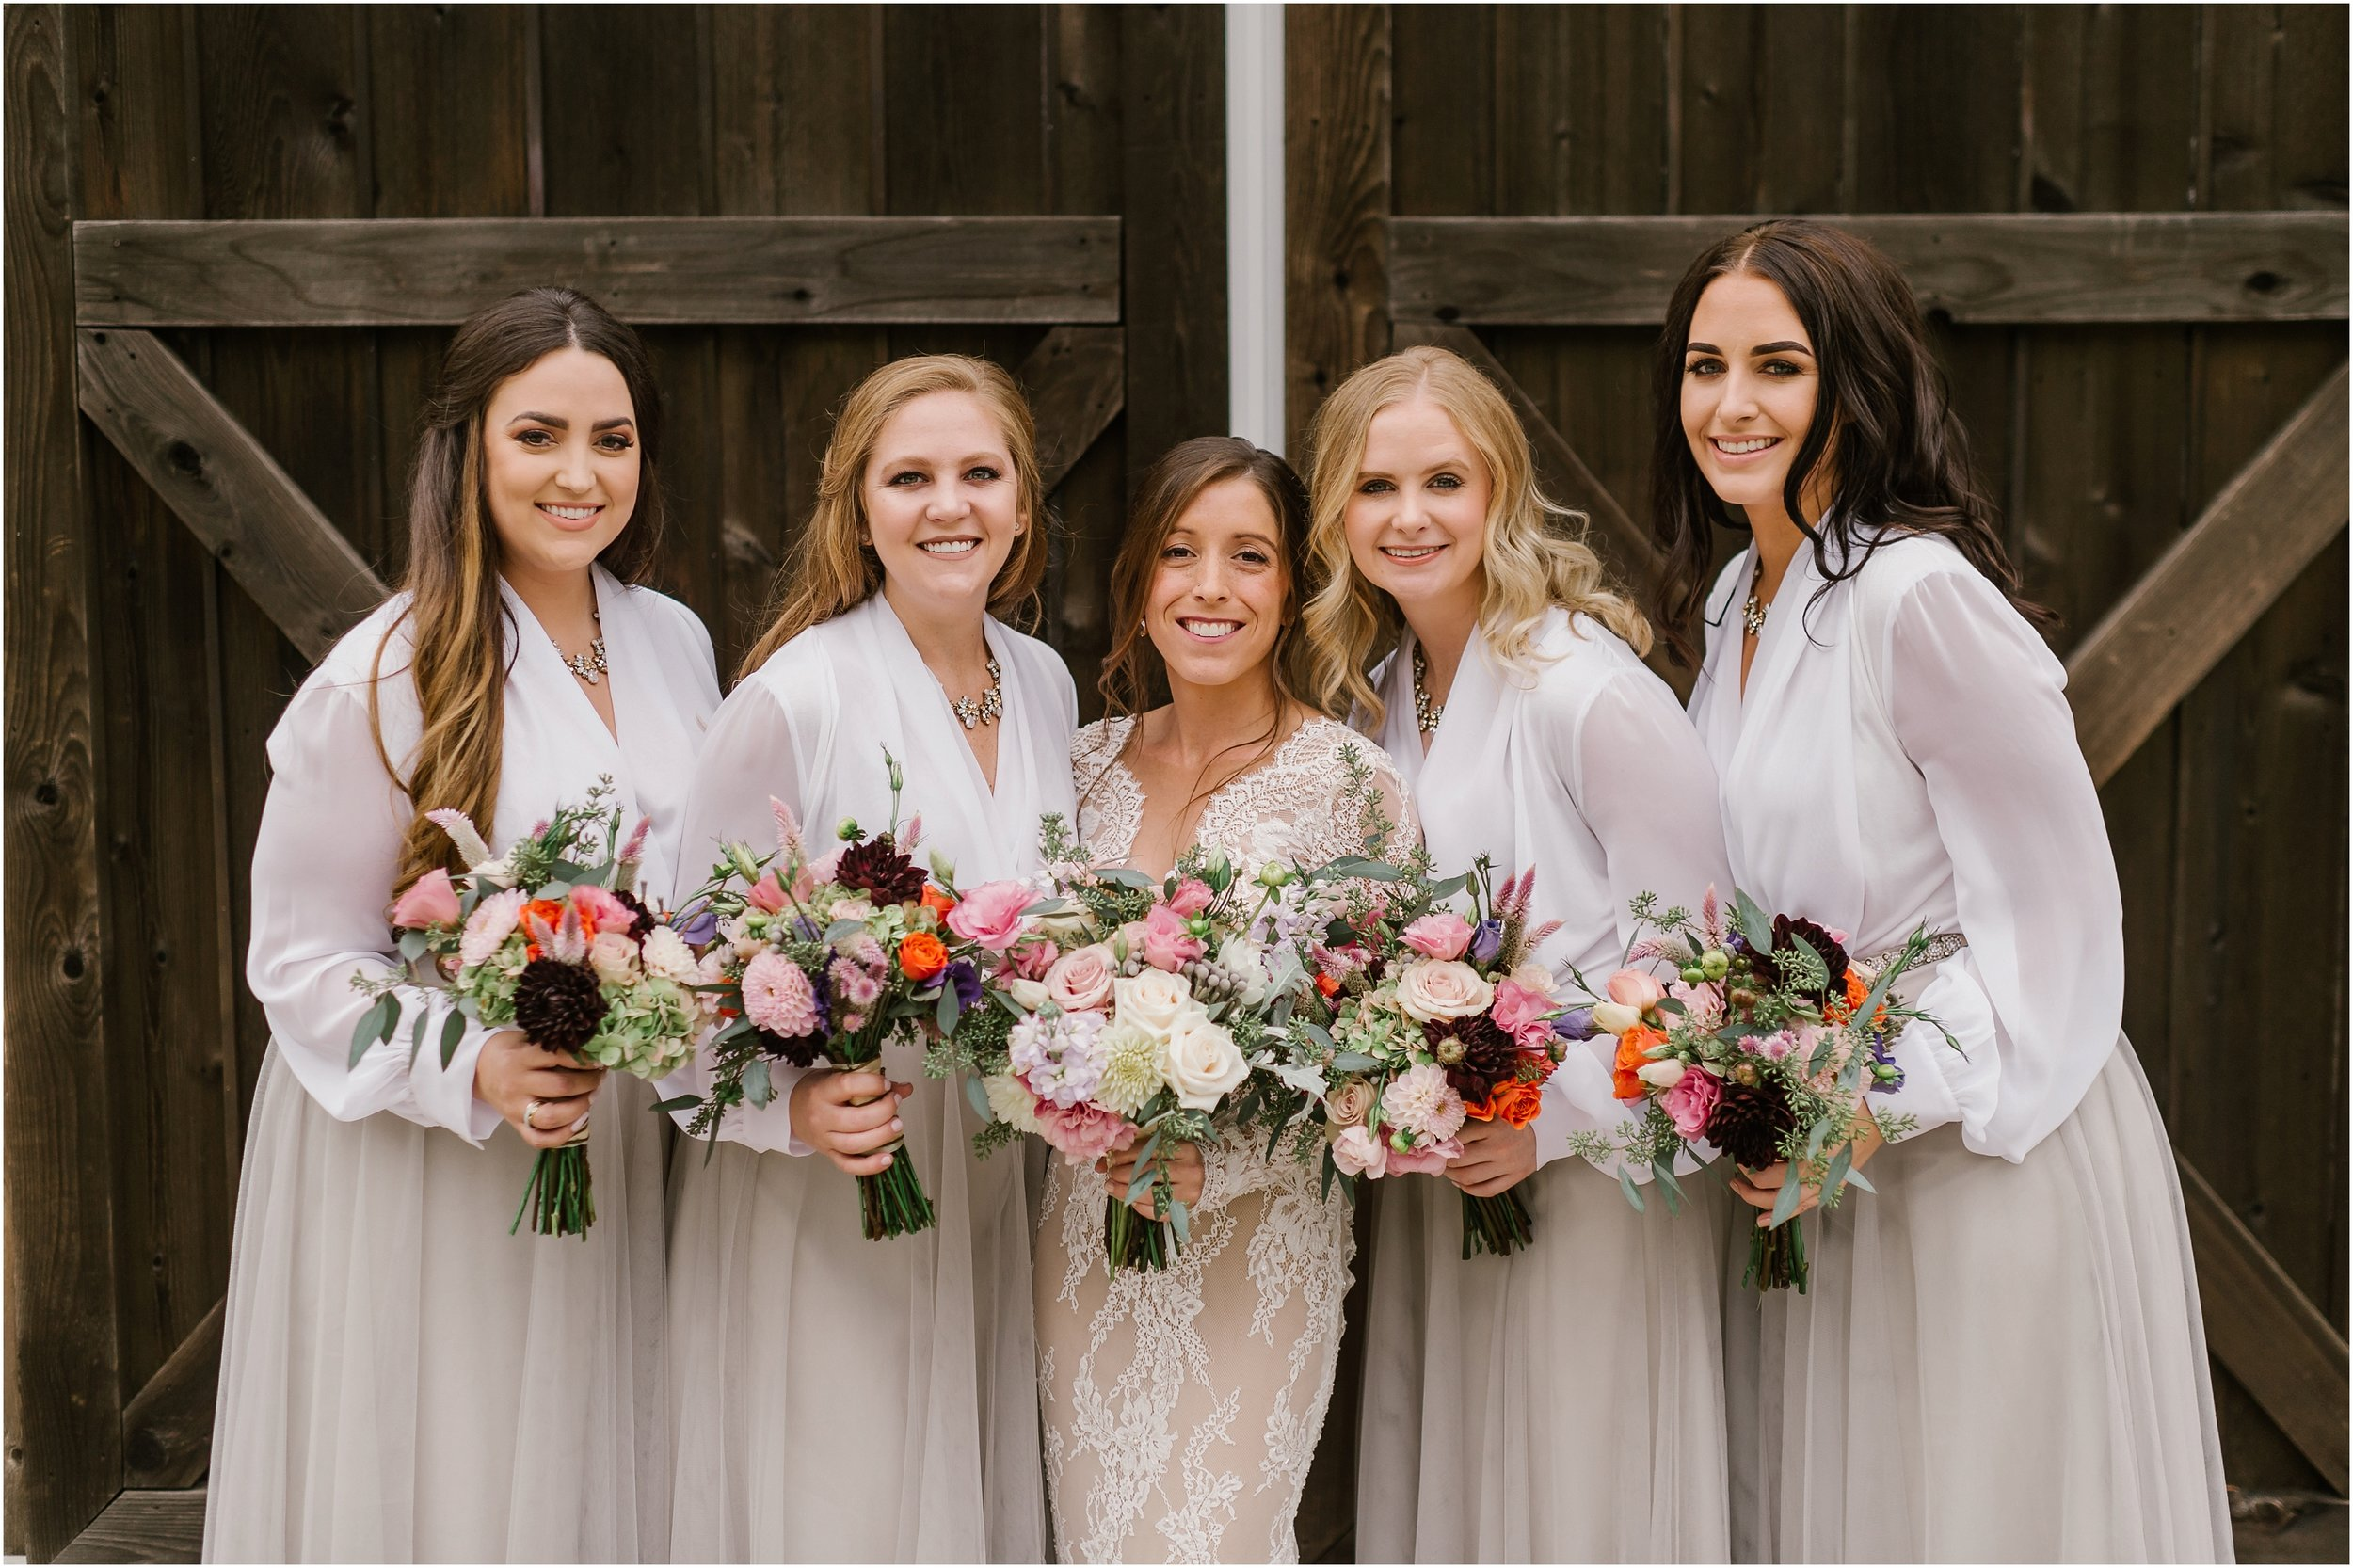 Rebecca_Shehorn_Photography_Indianapolis_Wedding_Photographer_9253.jpg